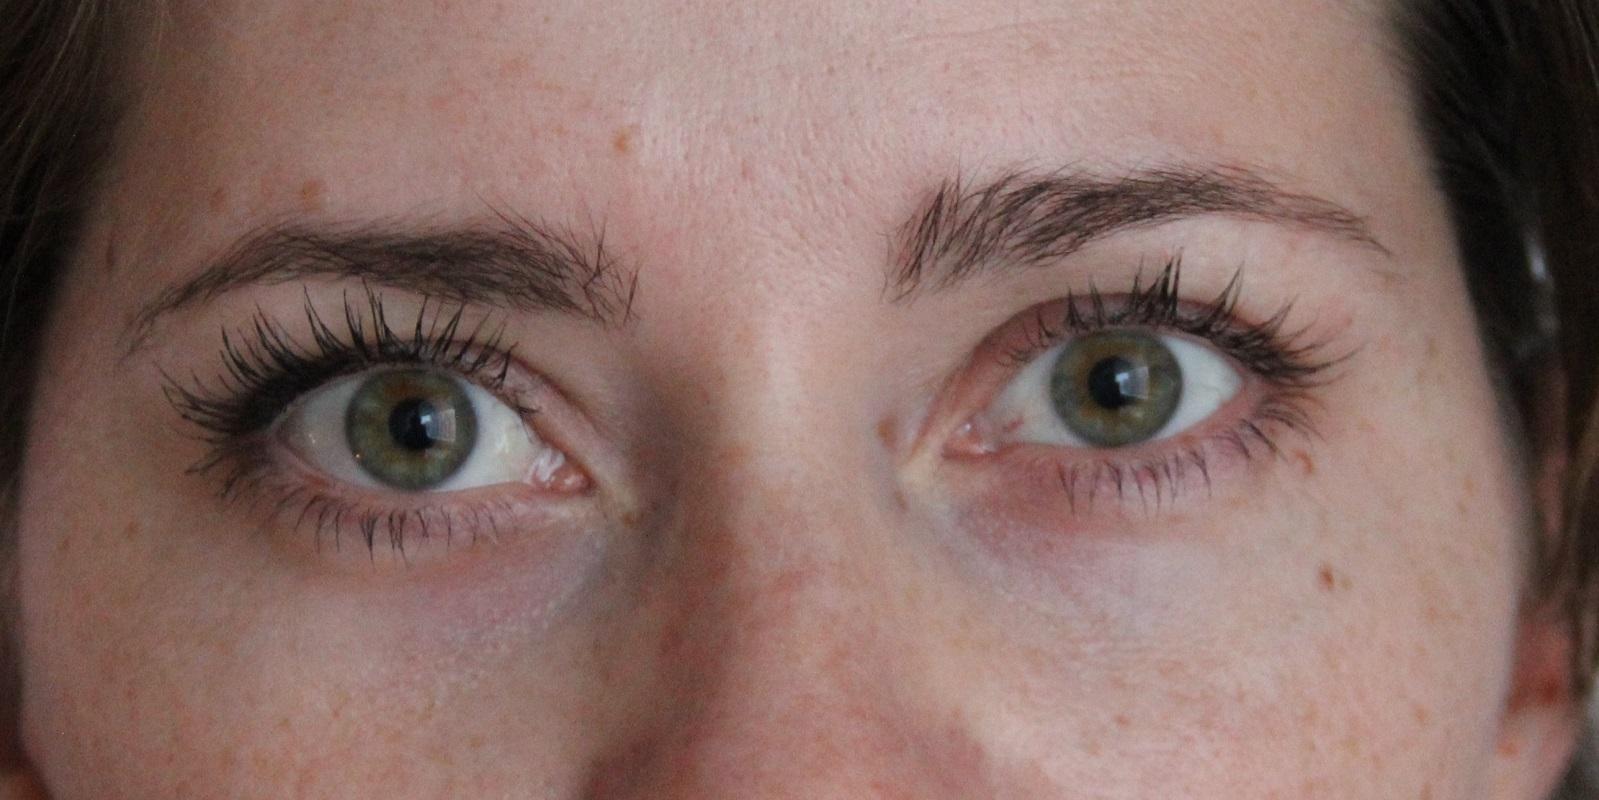 Mascara im Test MaxFactor TrendyThursday BineLovesLife